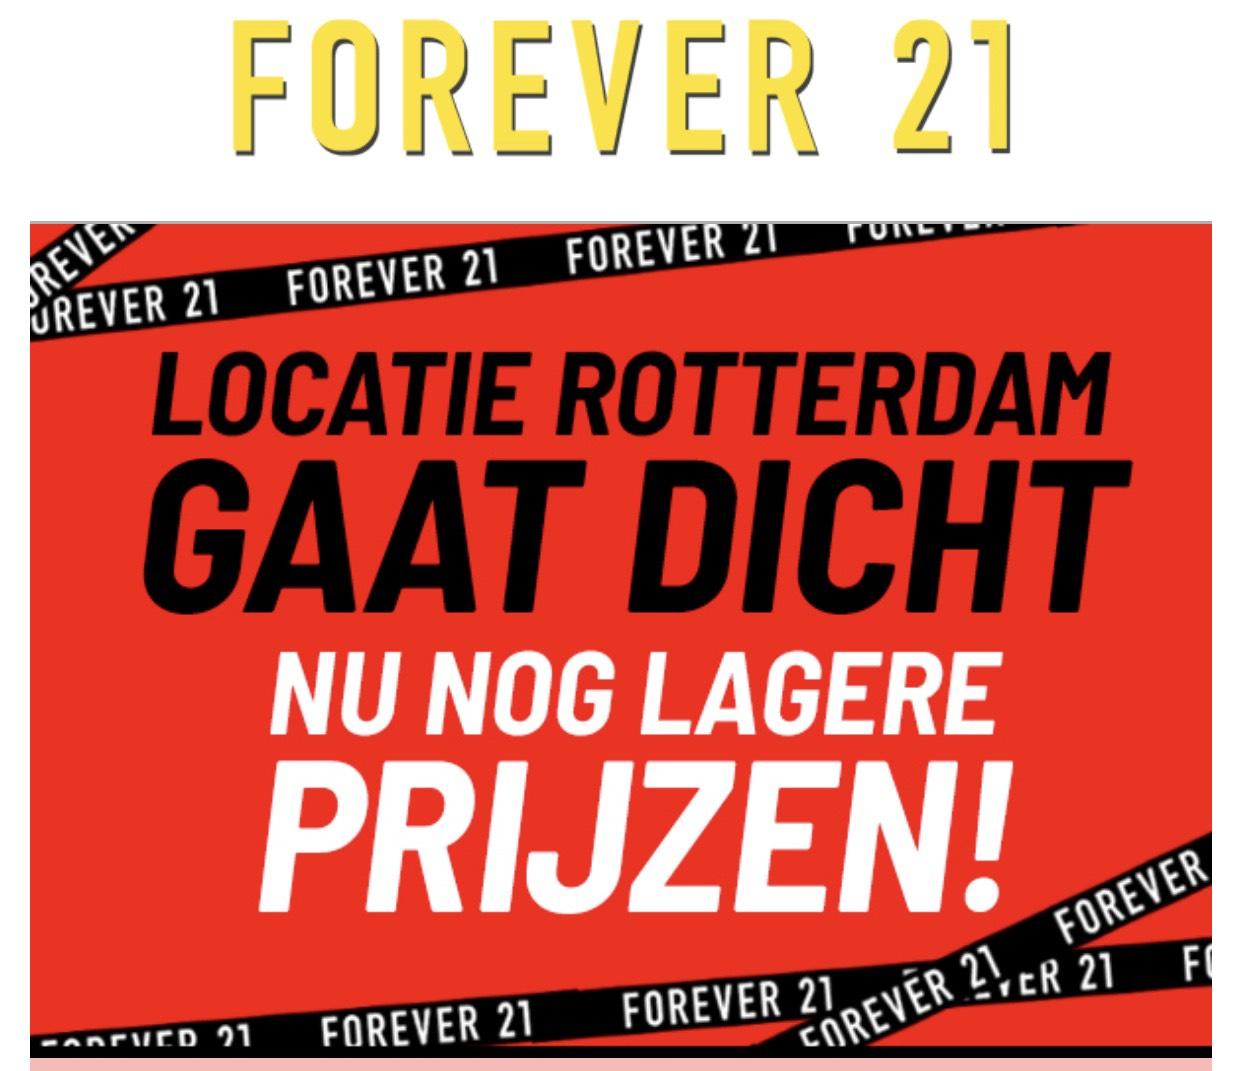 Forever 21 Locatie rotterdam gaat dicht